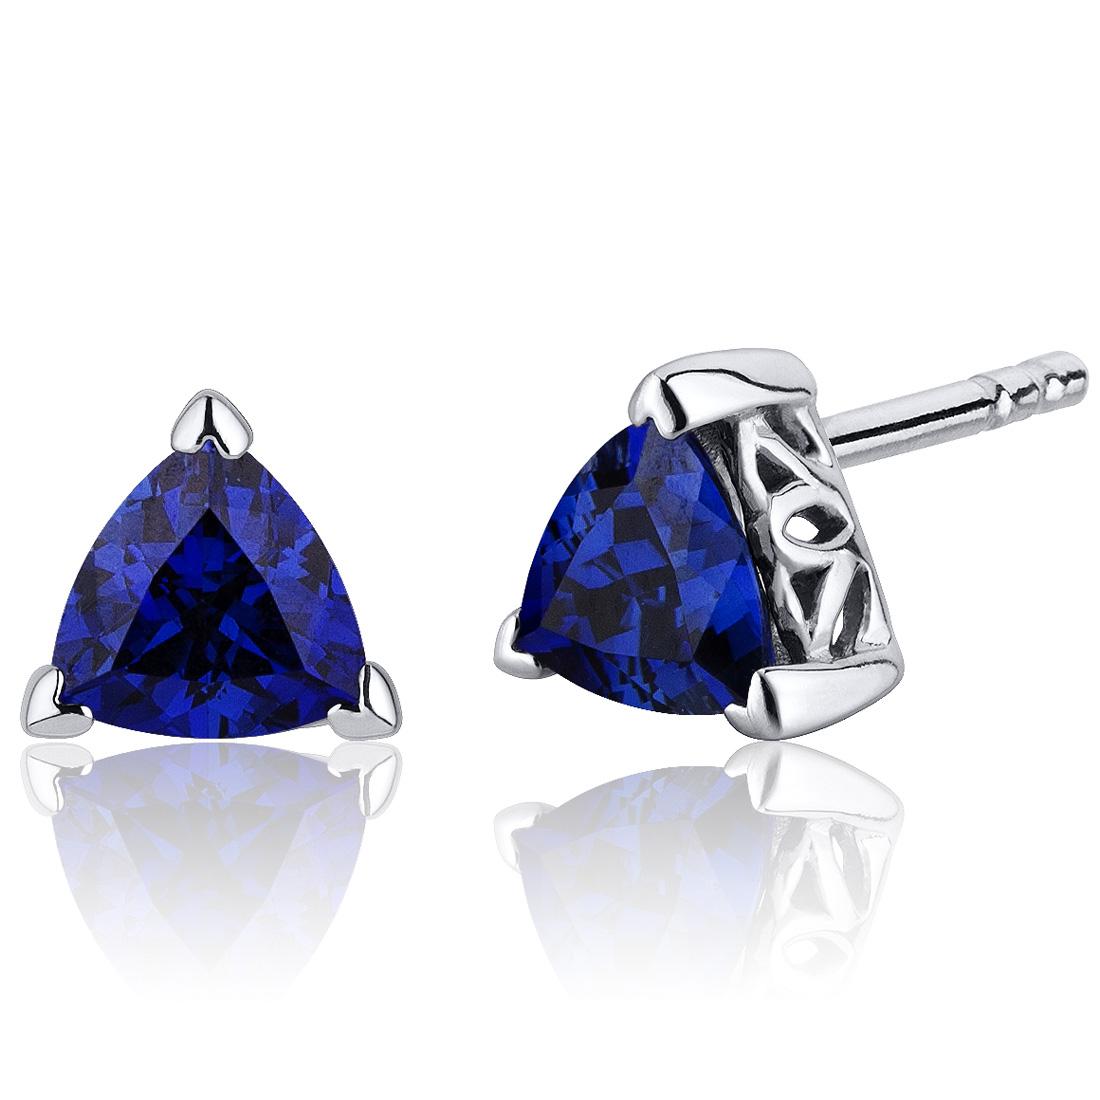 2.00 Ct Trillion Cut Blue Sapphire Sterling Silver Stud Earrings Rhodium Finish